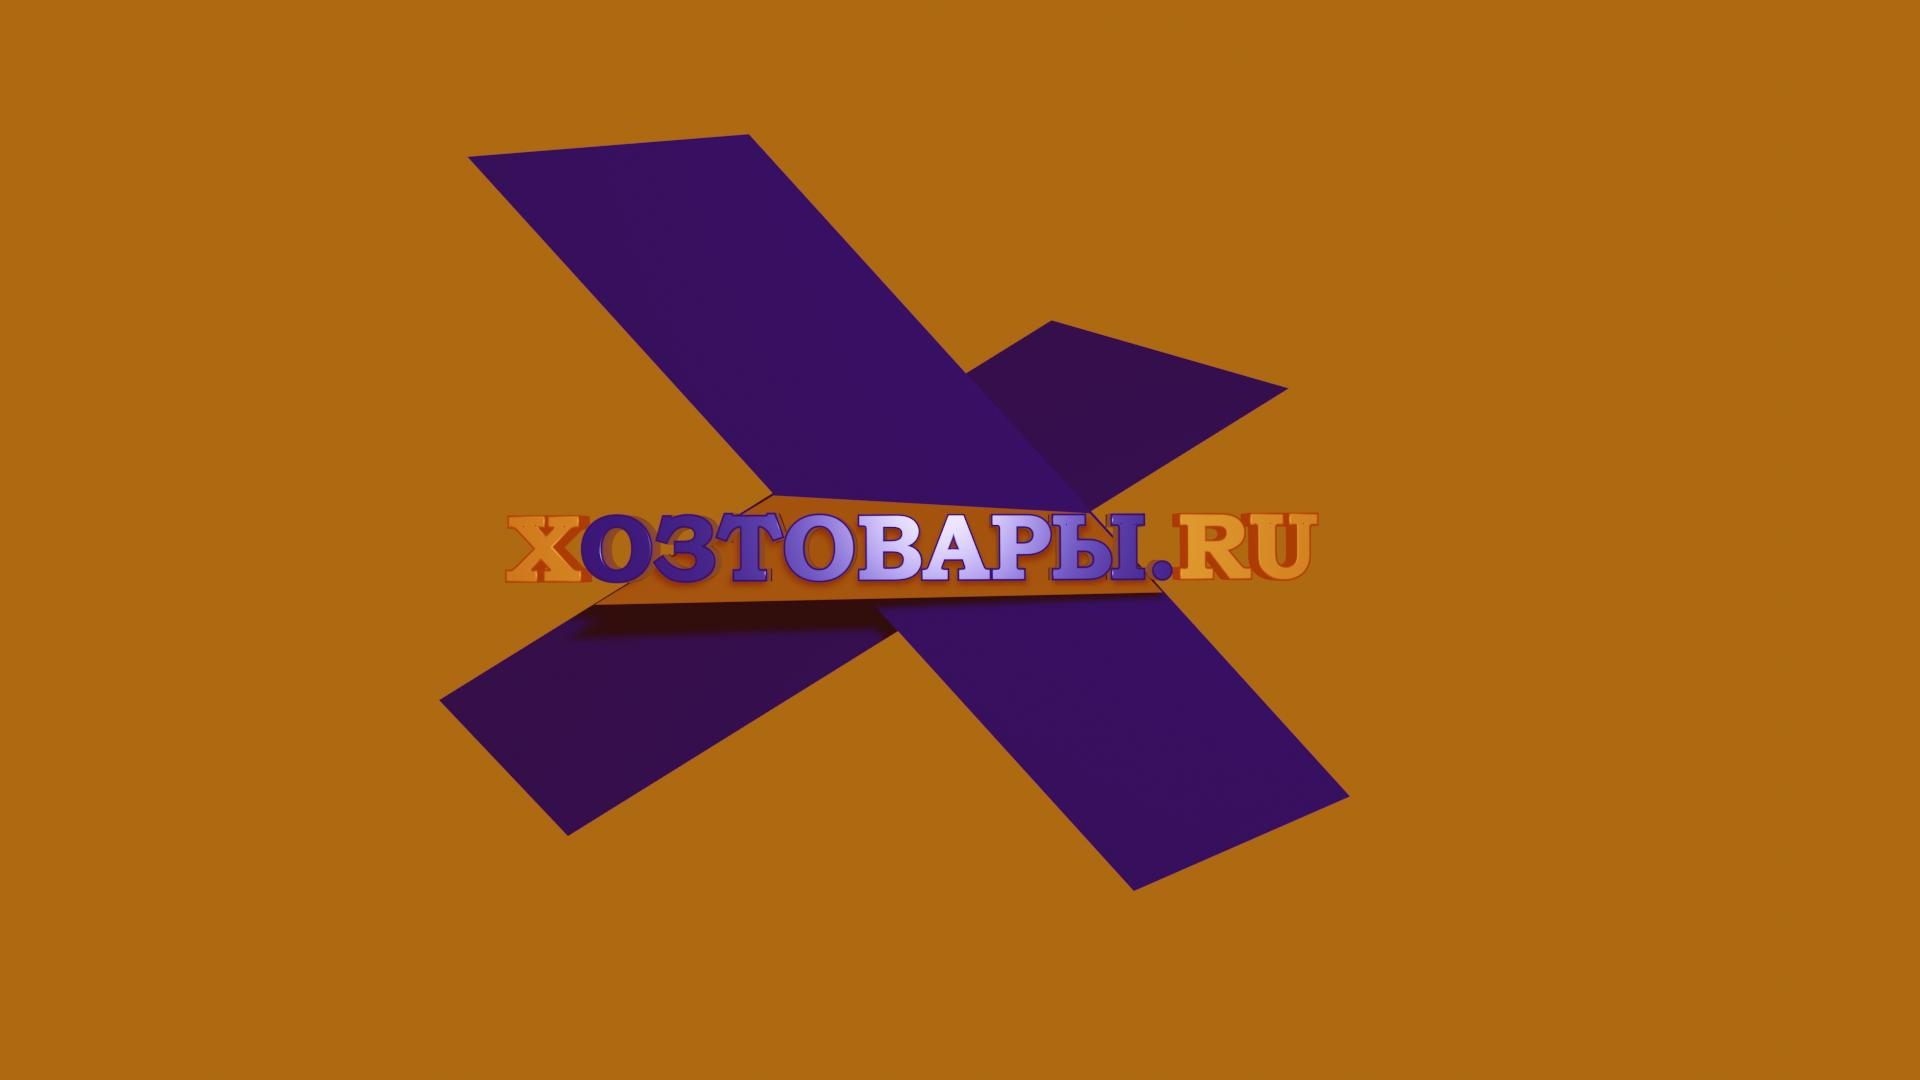 Разработка логотипа для оптового интернет-магазина «Хозтовары.ру» фото f_1016090064377e87.png